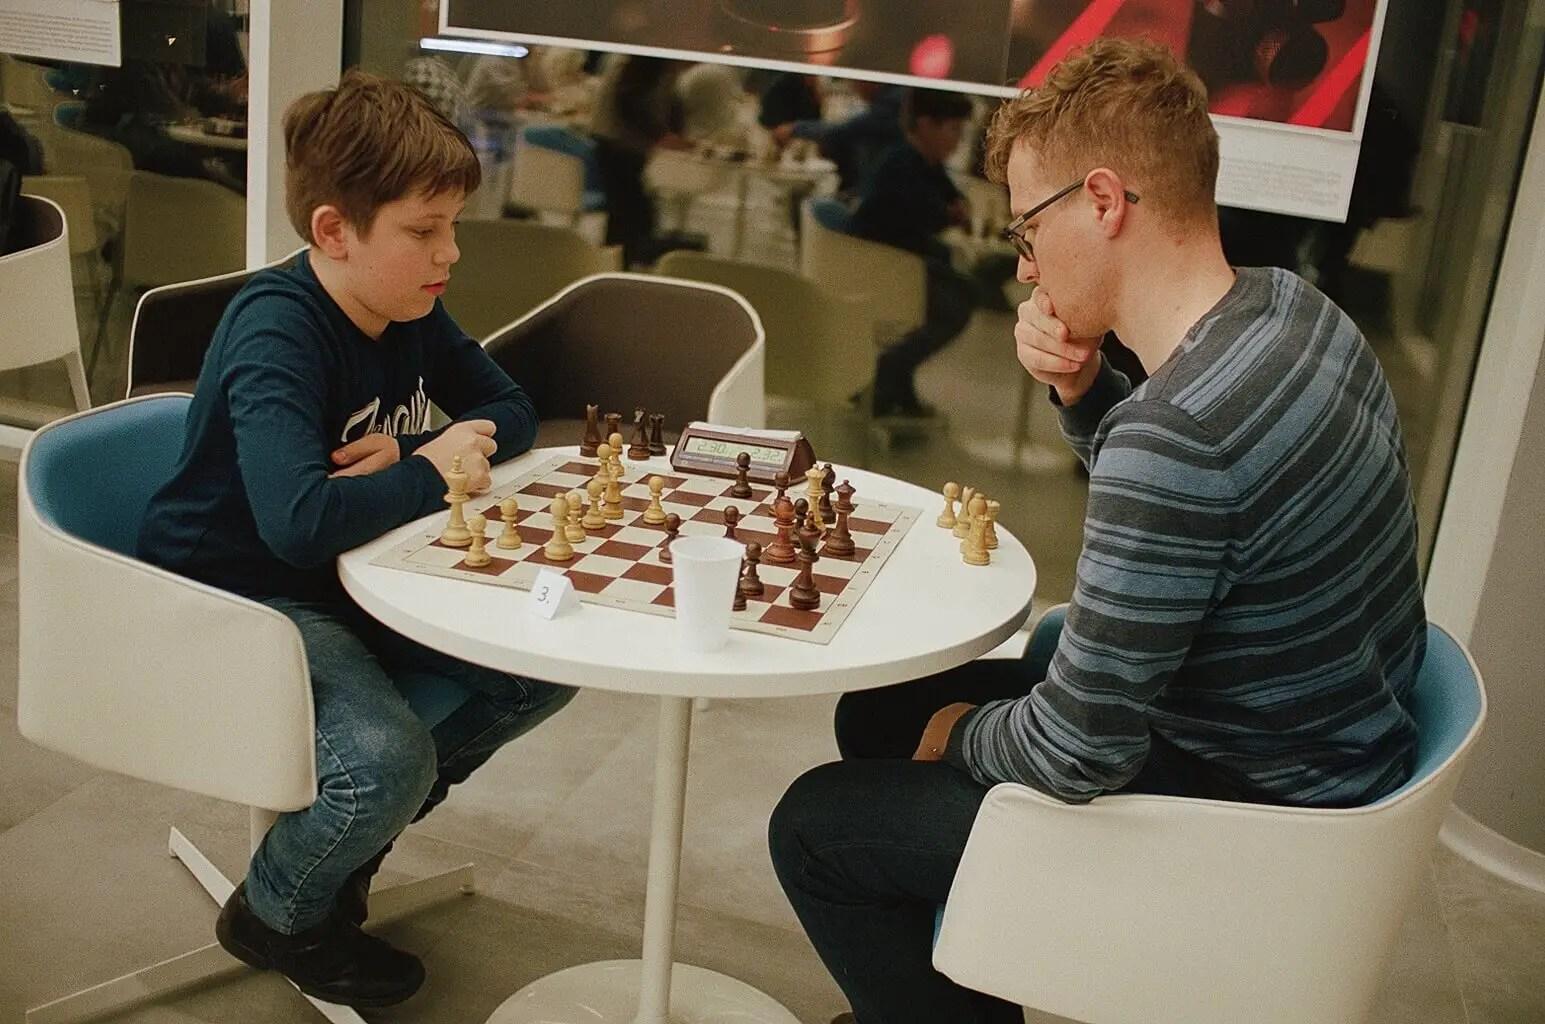 5 Frames... Of Chess at Vilnius University's FTMC on Kodak Portra 160 (35mm Format : EI 200 : Nikon F3 + Nikon Nikkor 50mm f:1.8 AI) - by Arutis